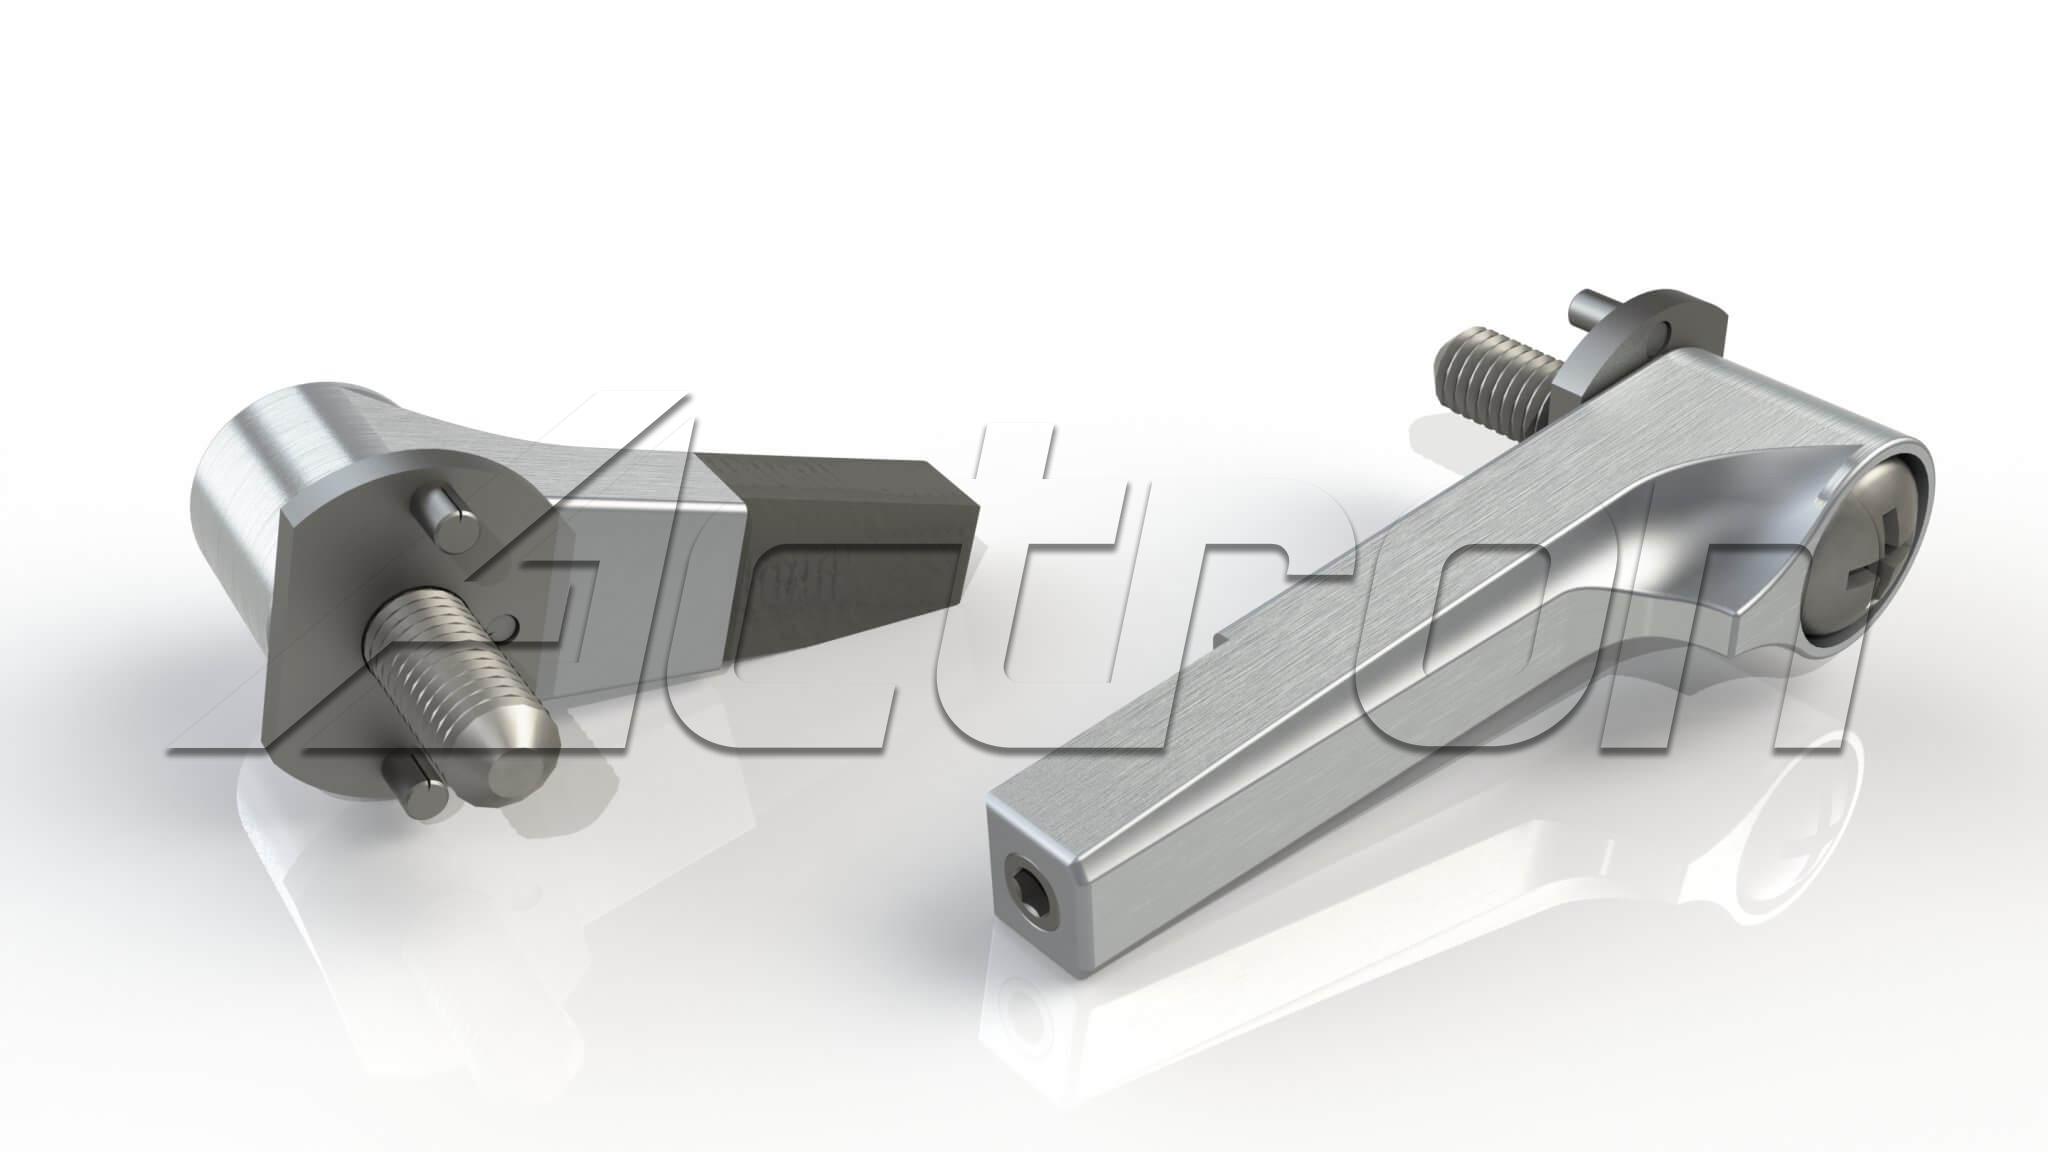 1-4-turn-retainer-4874-a35667.jpg